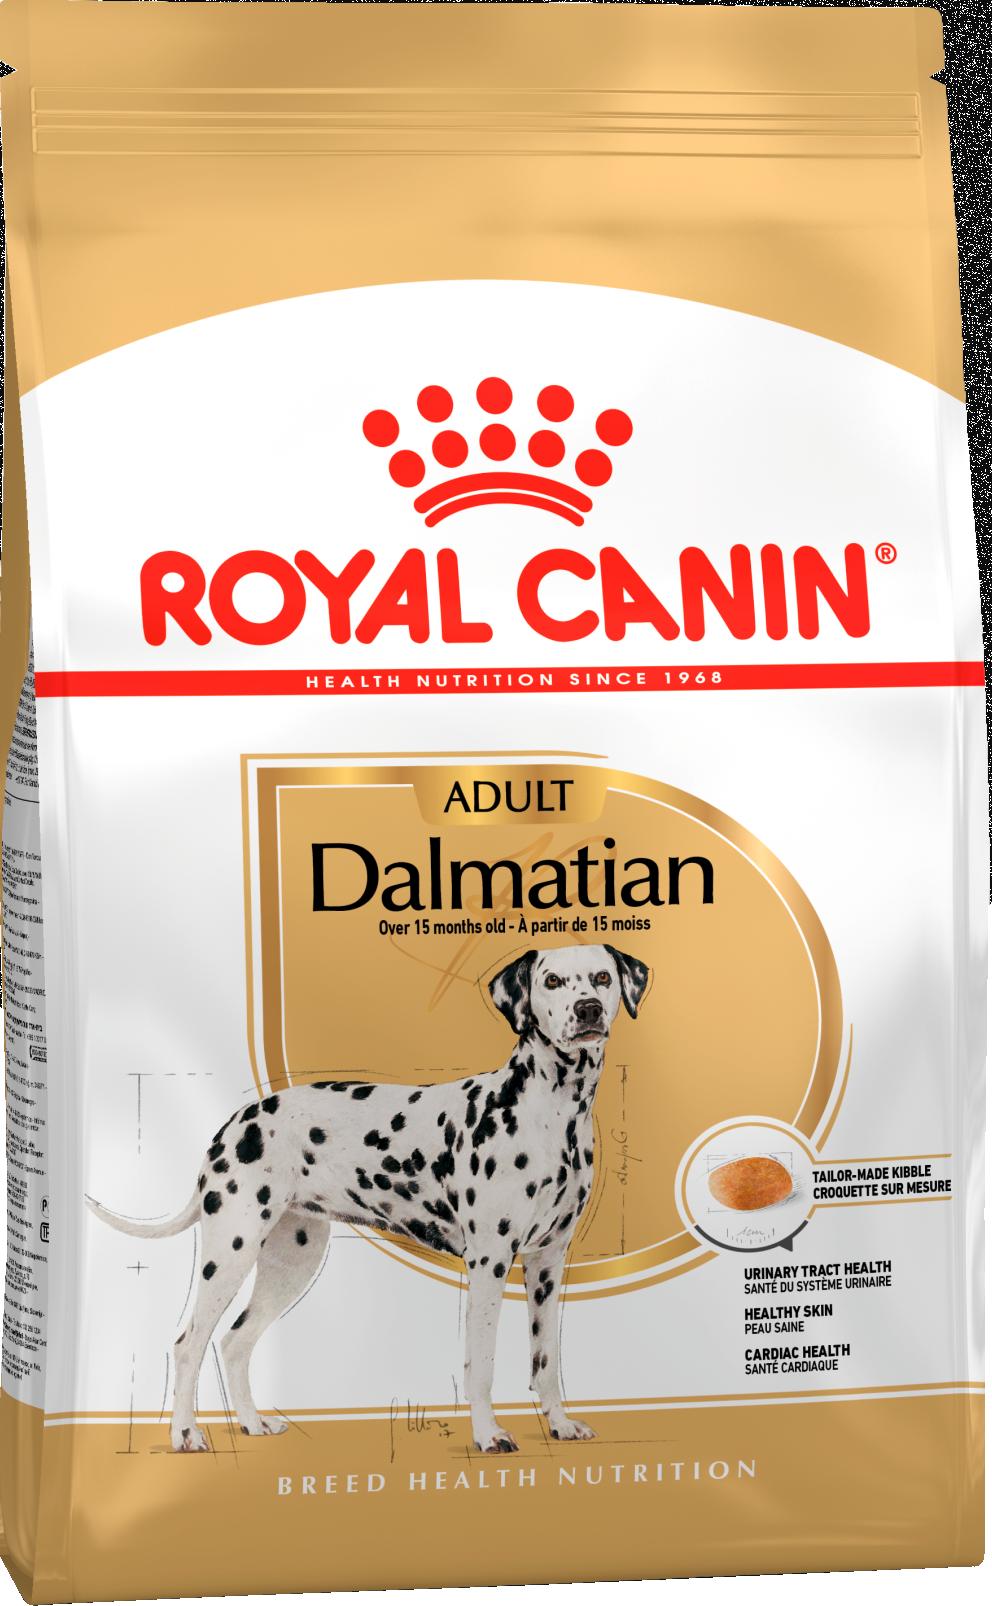 Royal Canin Корм для взрослых собак породы далматин, Royal Canin Dalmatian Adult 379120.png